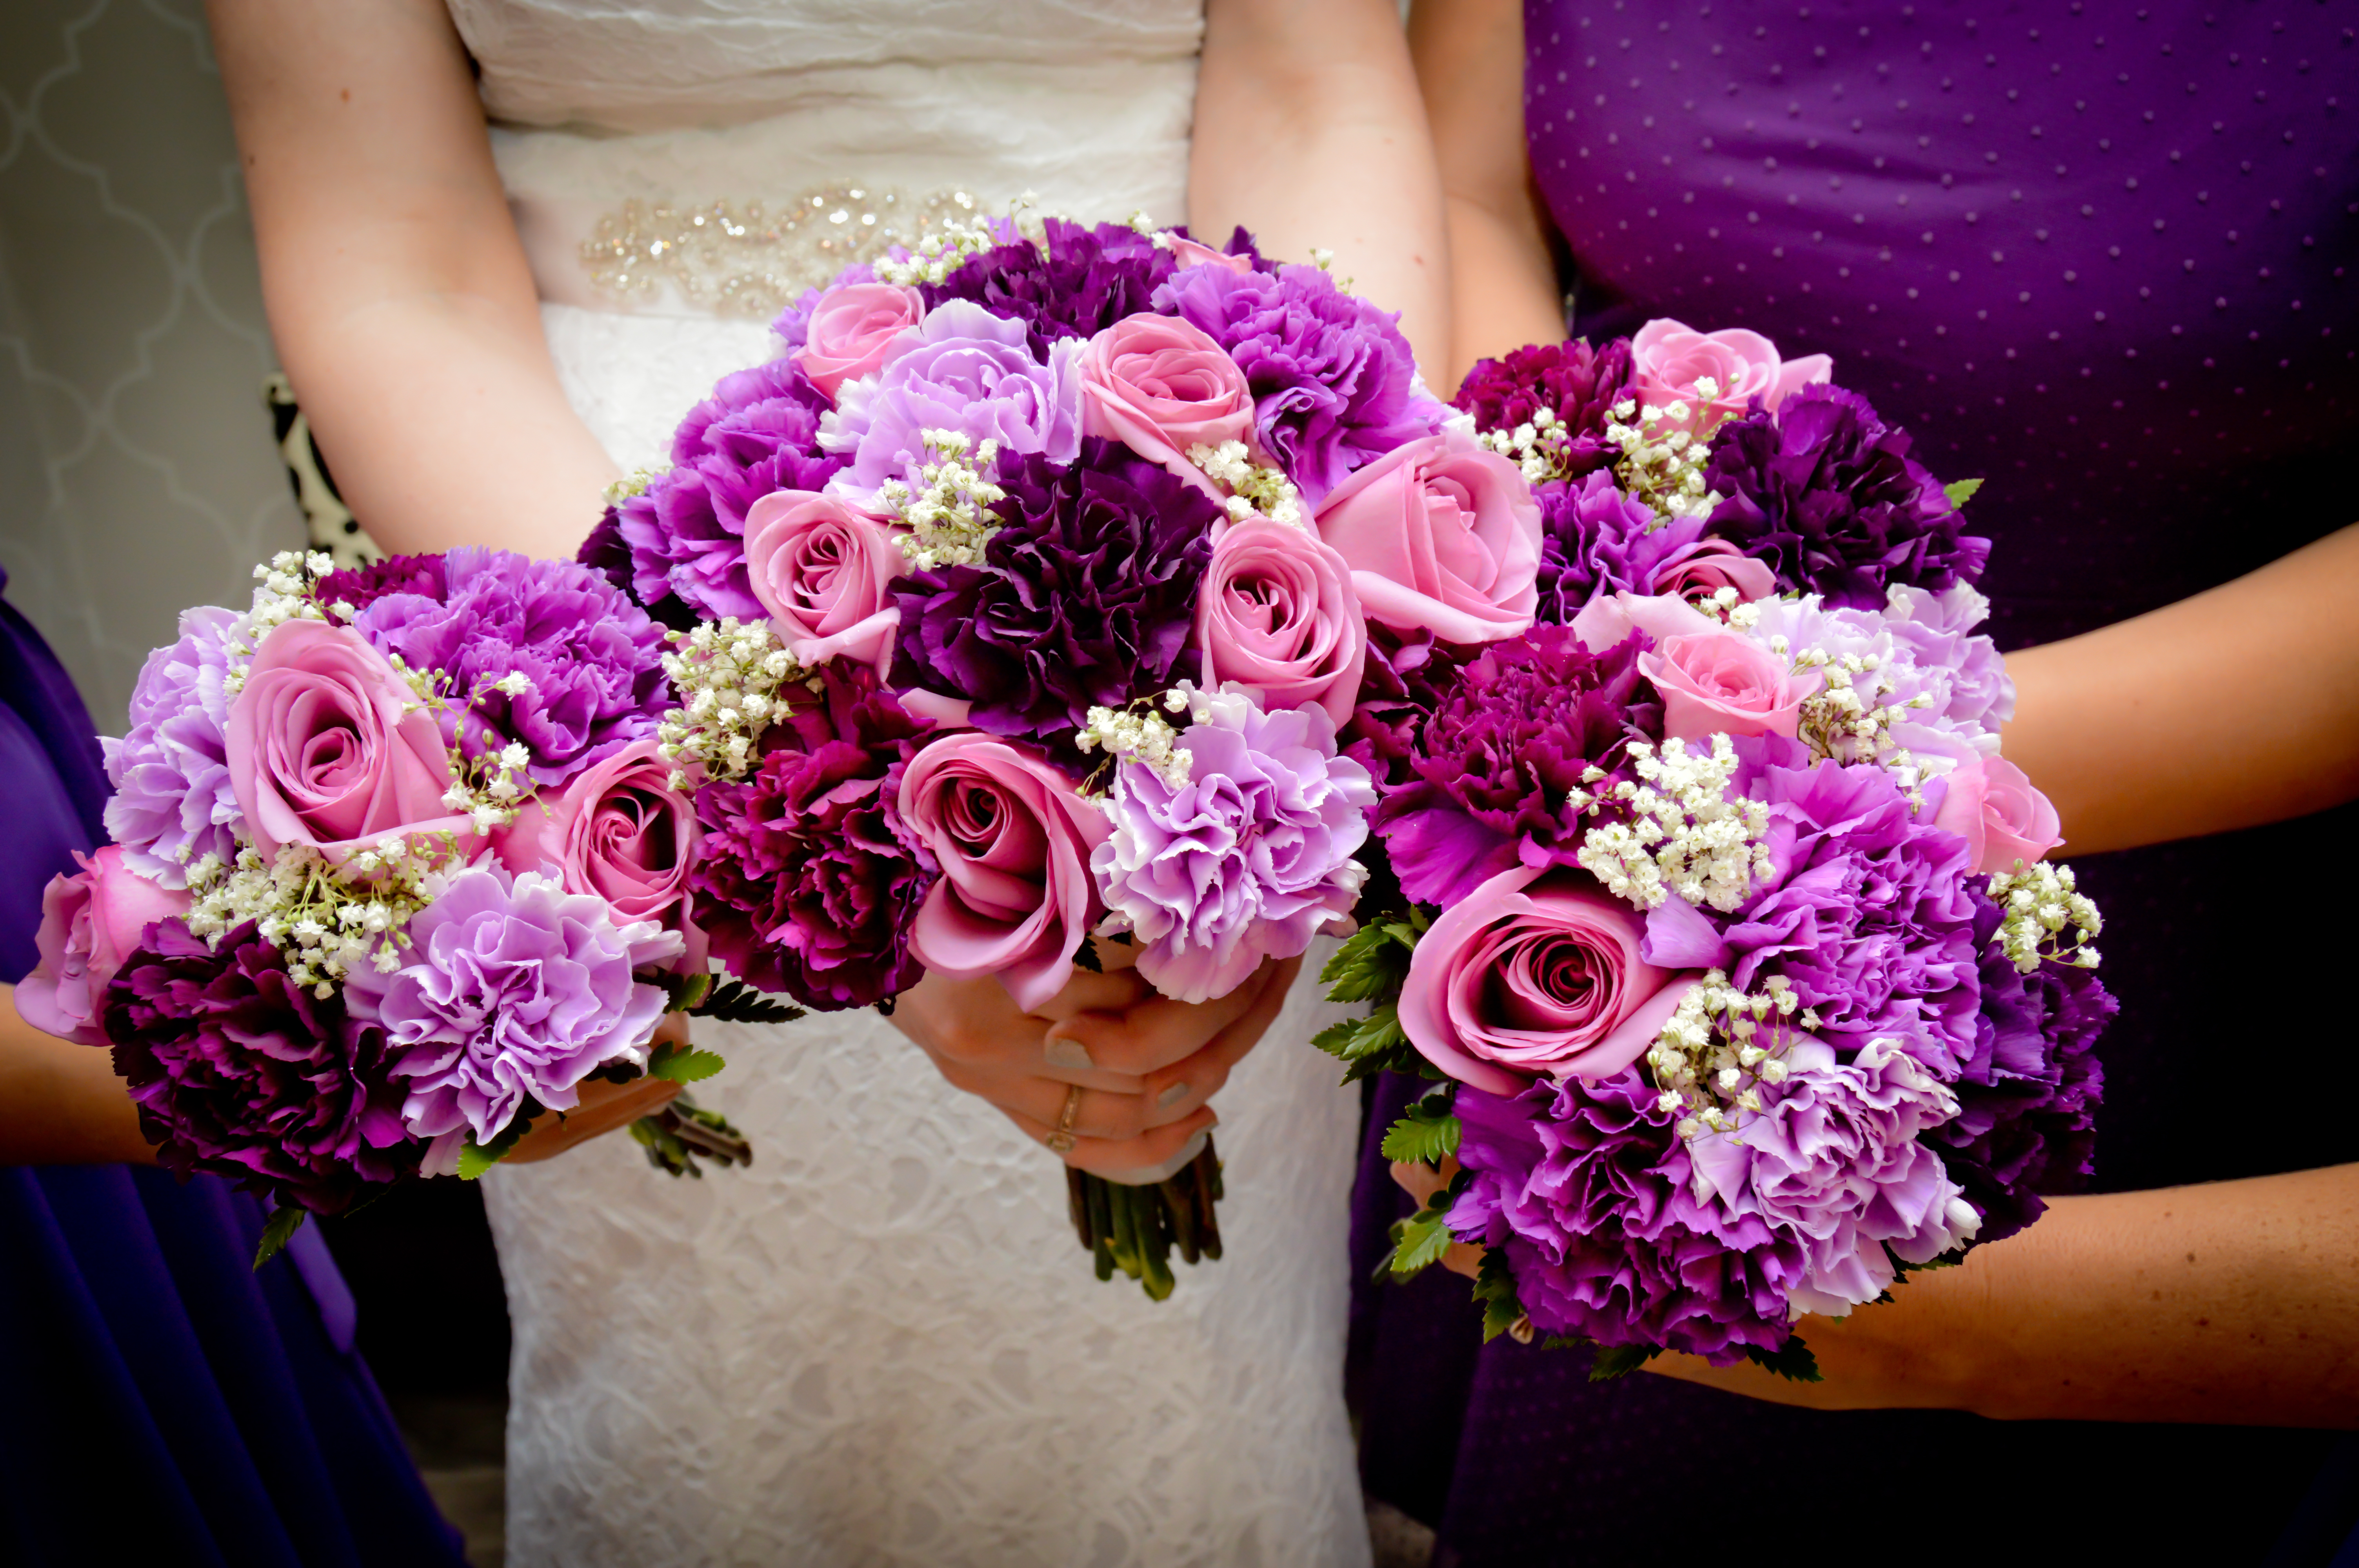 Why Should I Hire a Wedding Coordinator?